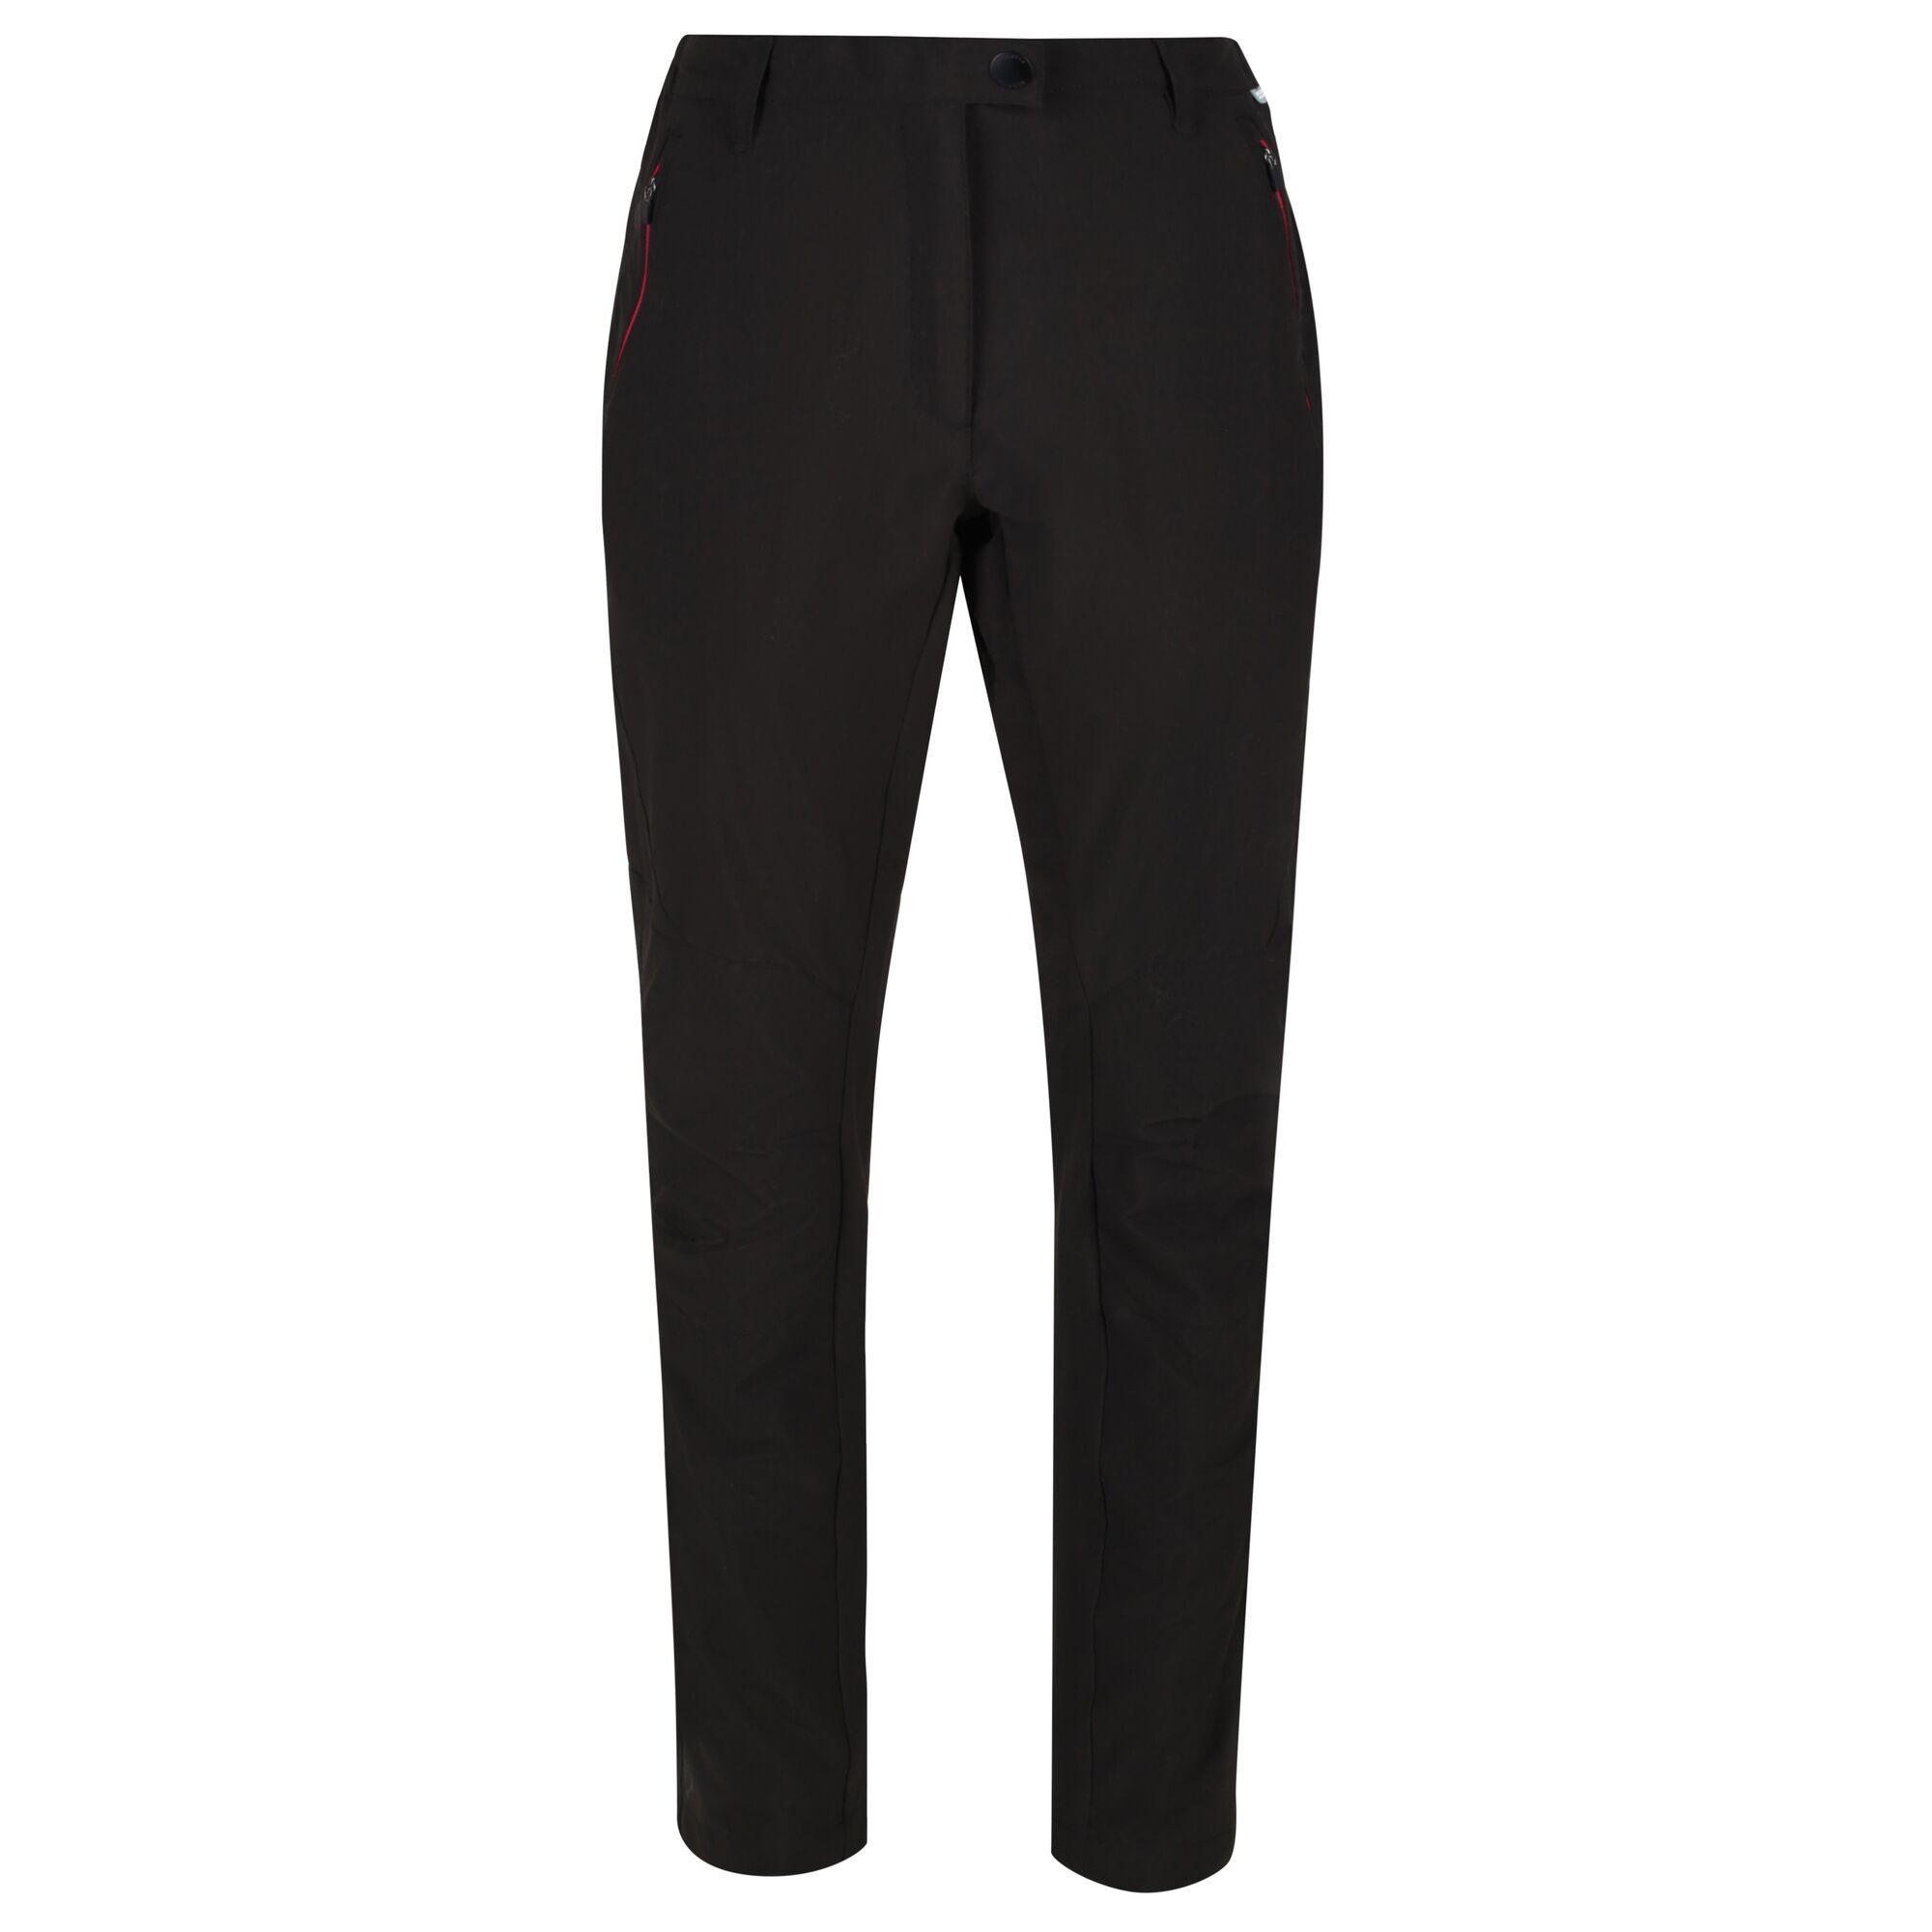 Regatta Womens/Ladies Highton Walking Trousers (Black/Dark Cerise)